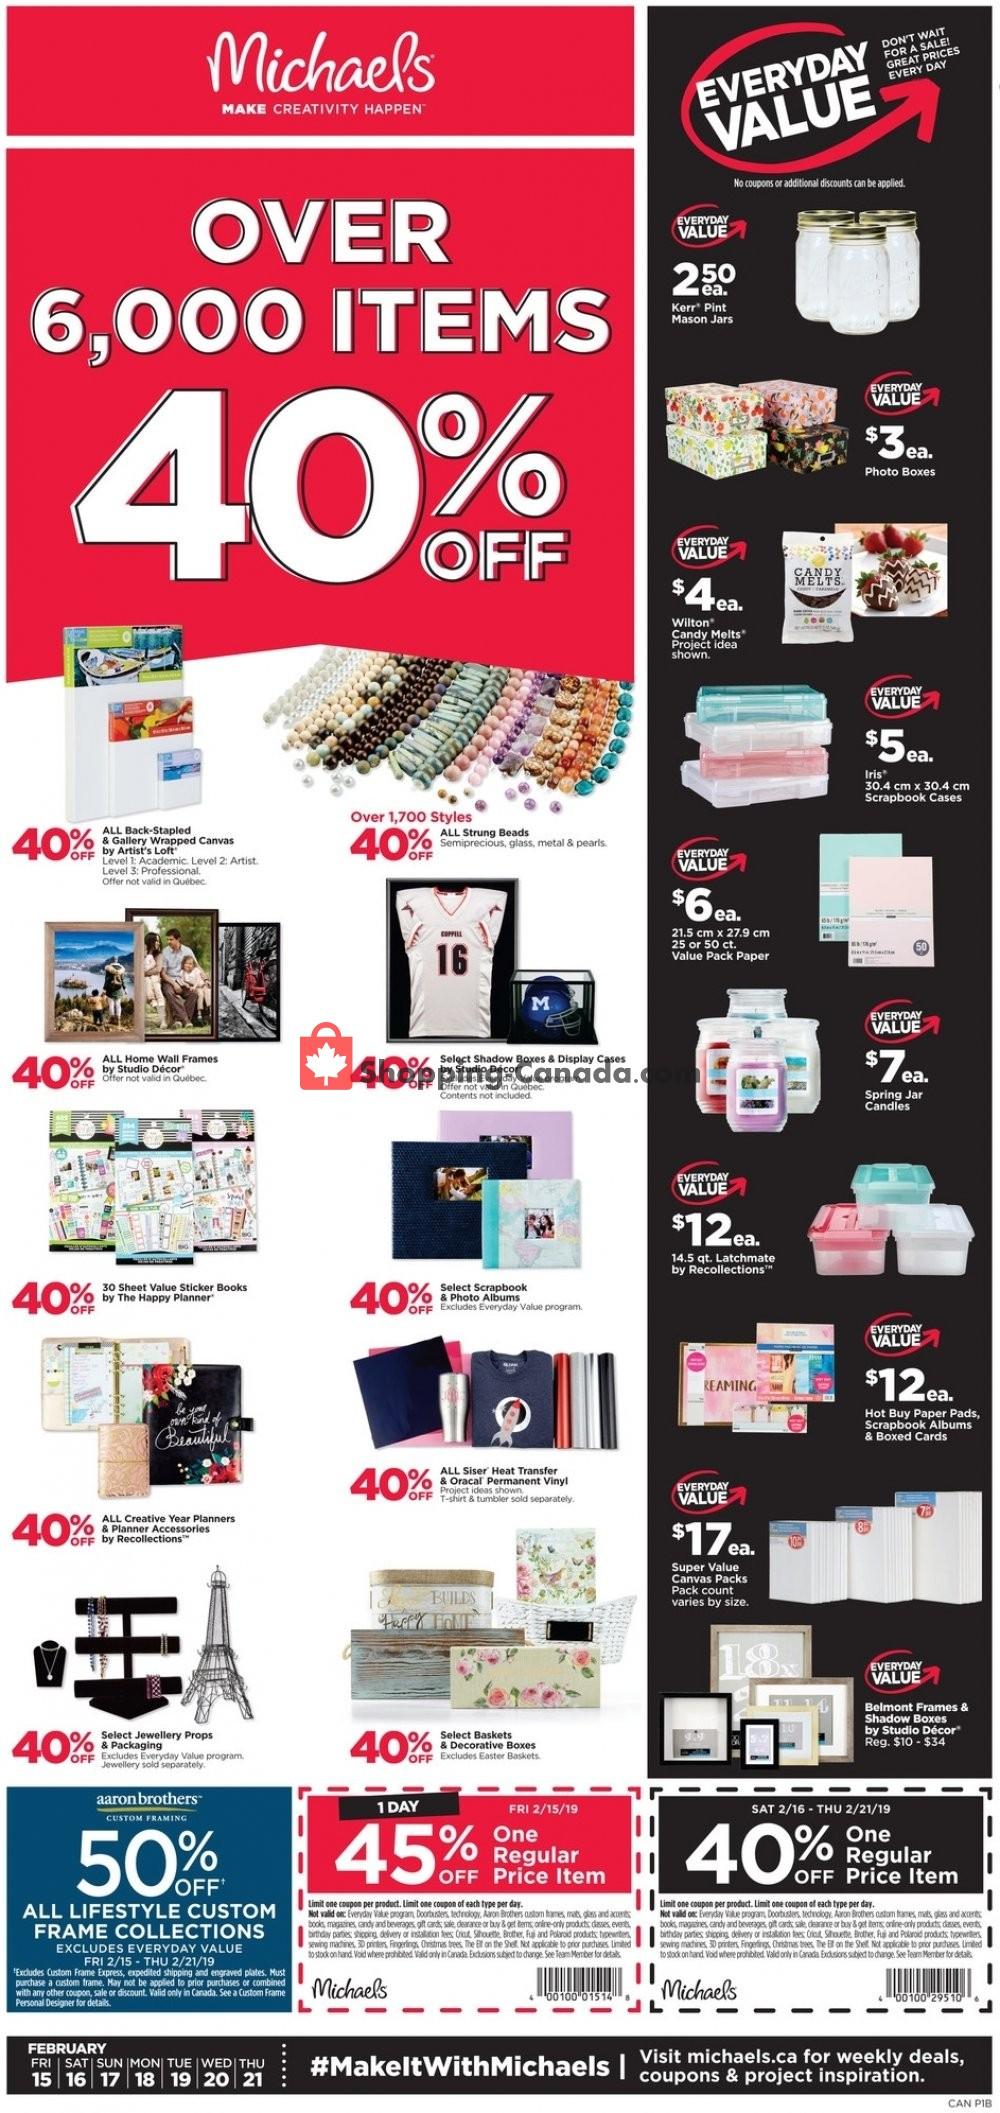 Michaels Canada Flyer Everyday Value February 15 February 21 2019 Shopping Canada